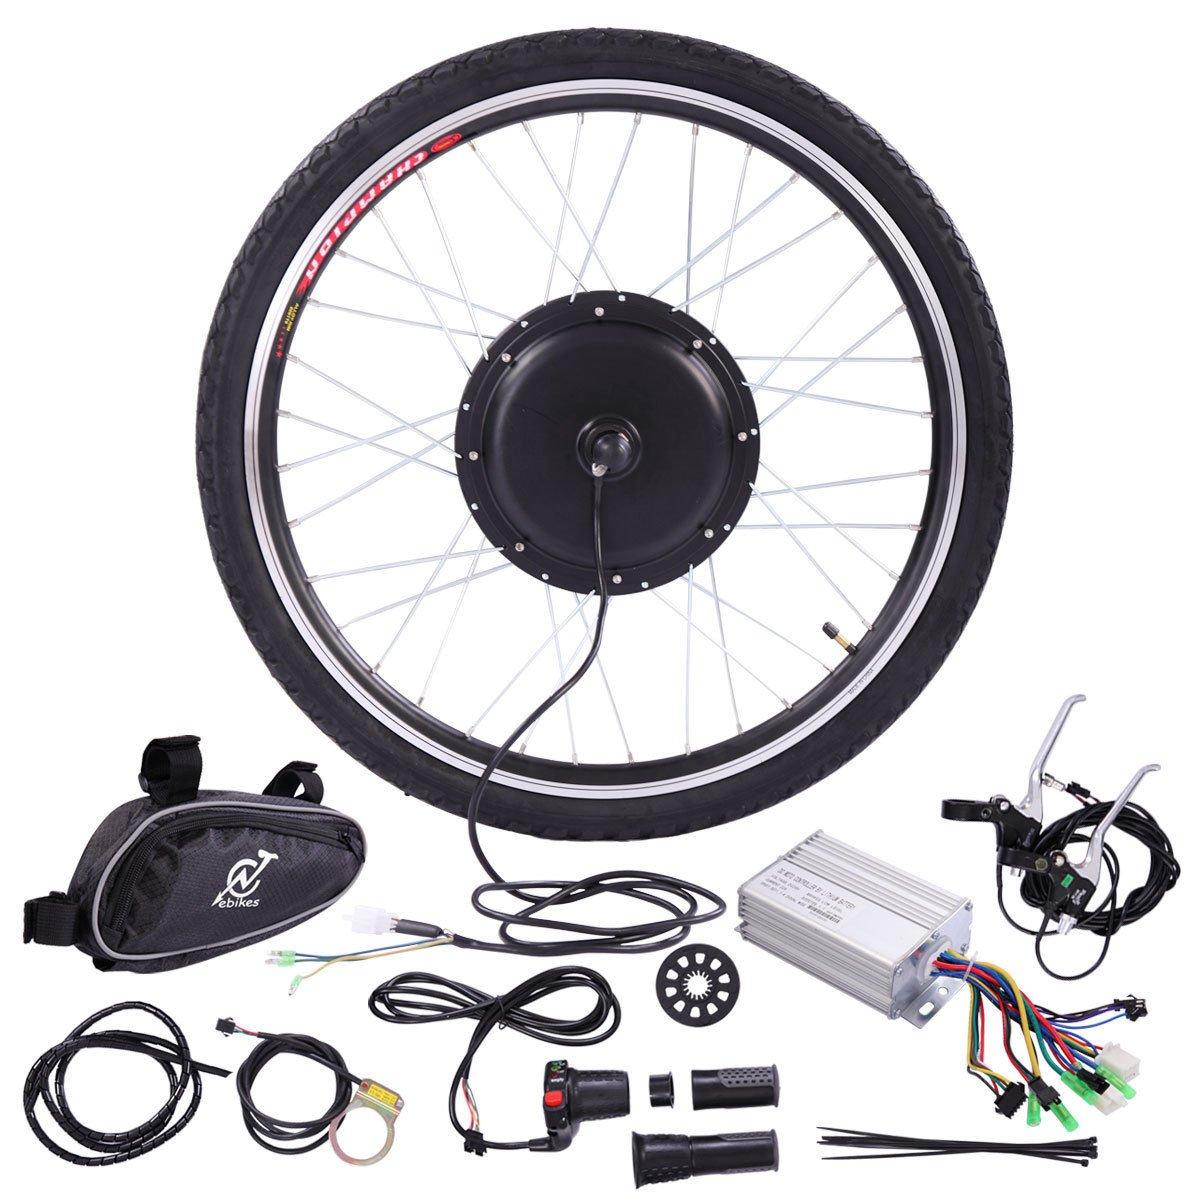 JAXPETY 36V 500W Electric Bicycle Cycle 26'' E Bike Front Wheel Ebike Hub Motor Conversion Kit Hub Motor Wheel by JAXPETY